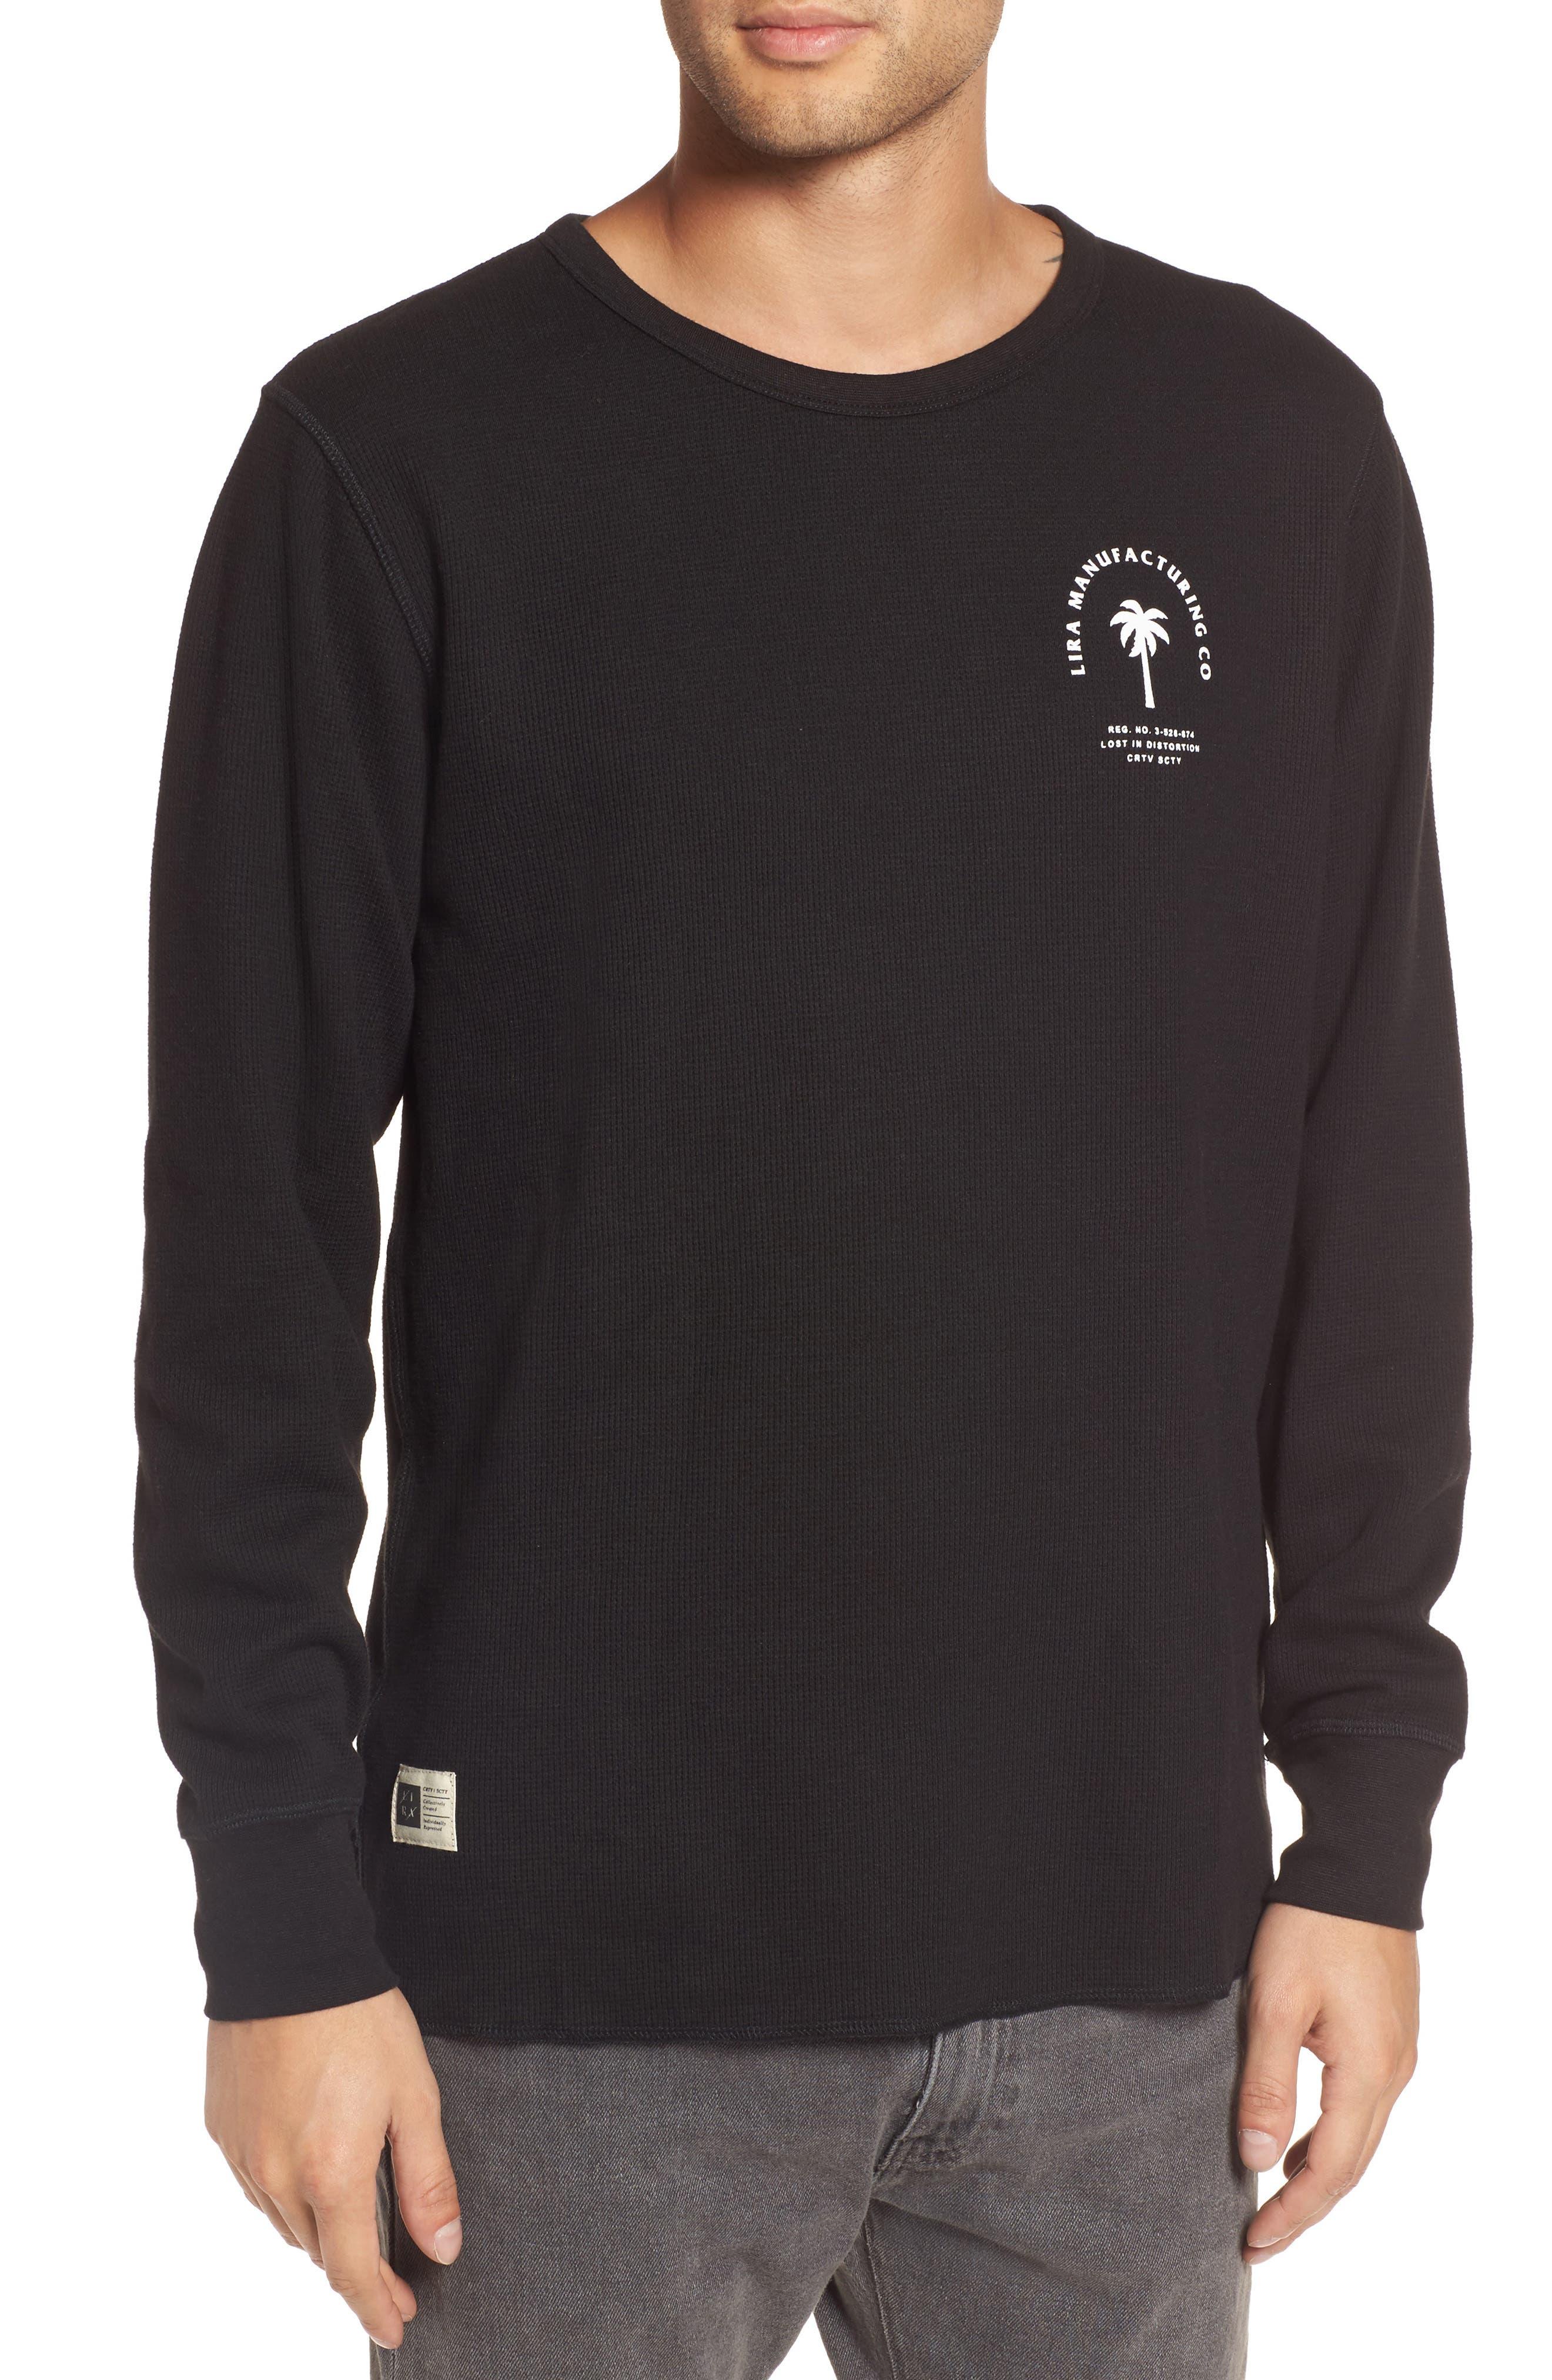 Main Image - Lira Clothing Cochino Thermal T-shirt